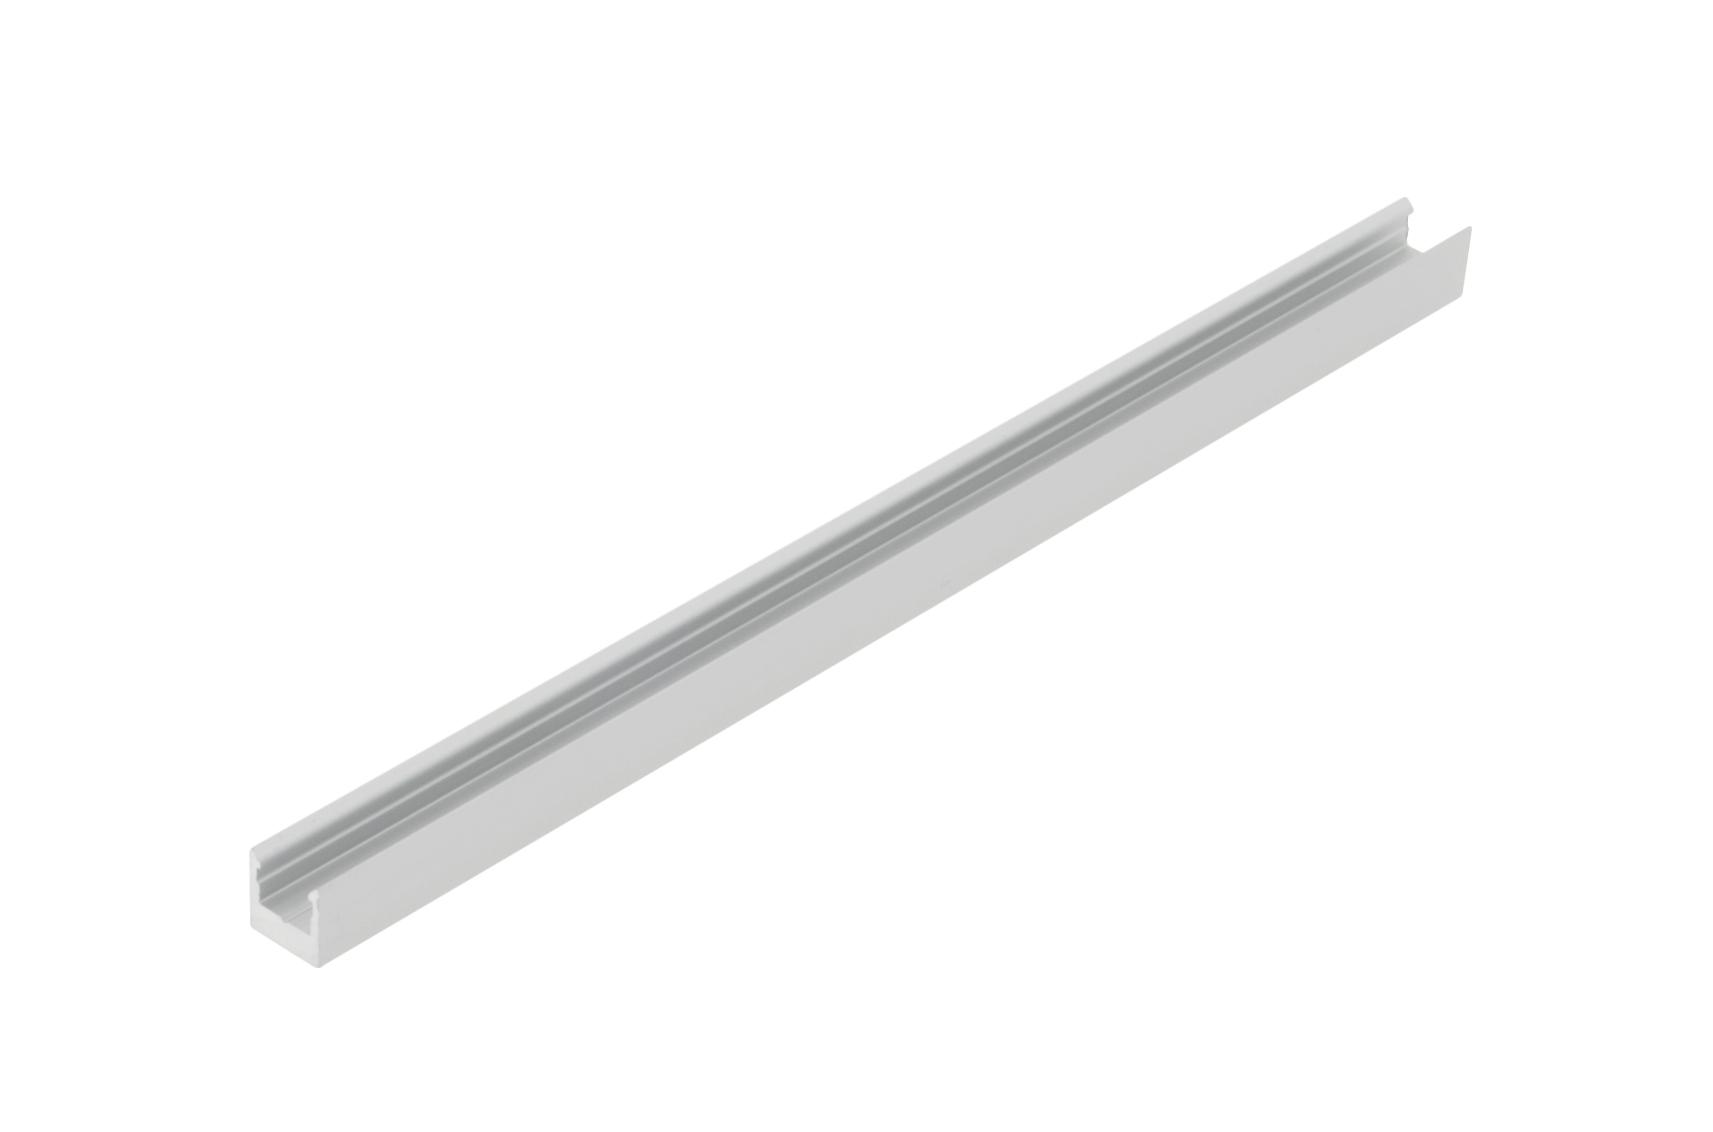 1 m Aluminium Profil XSR, 2m LIAP007001